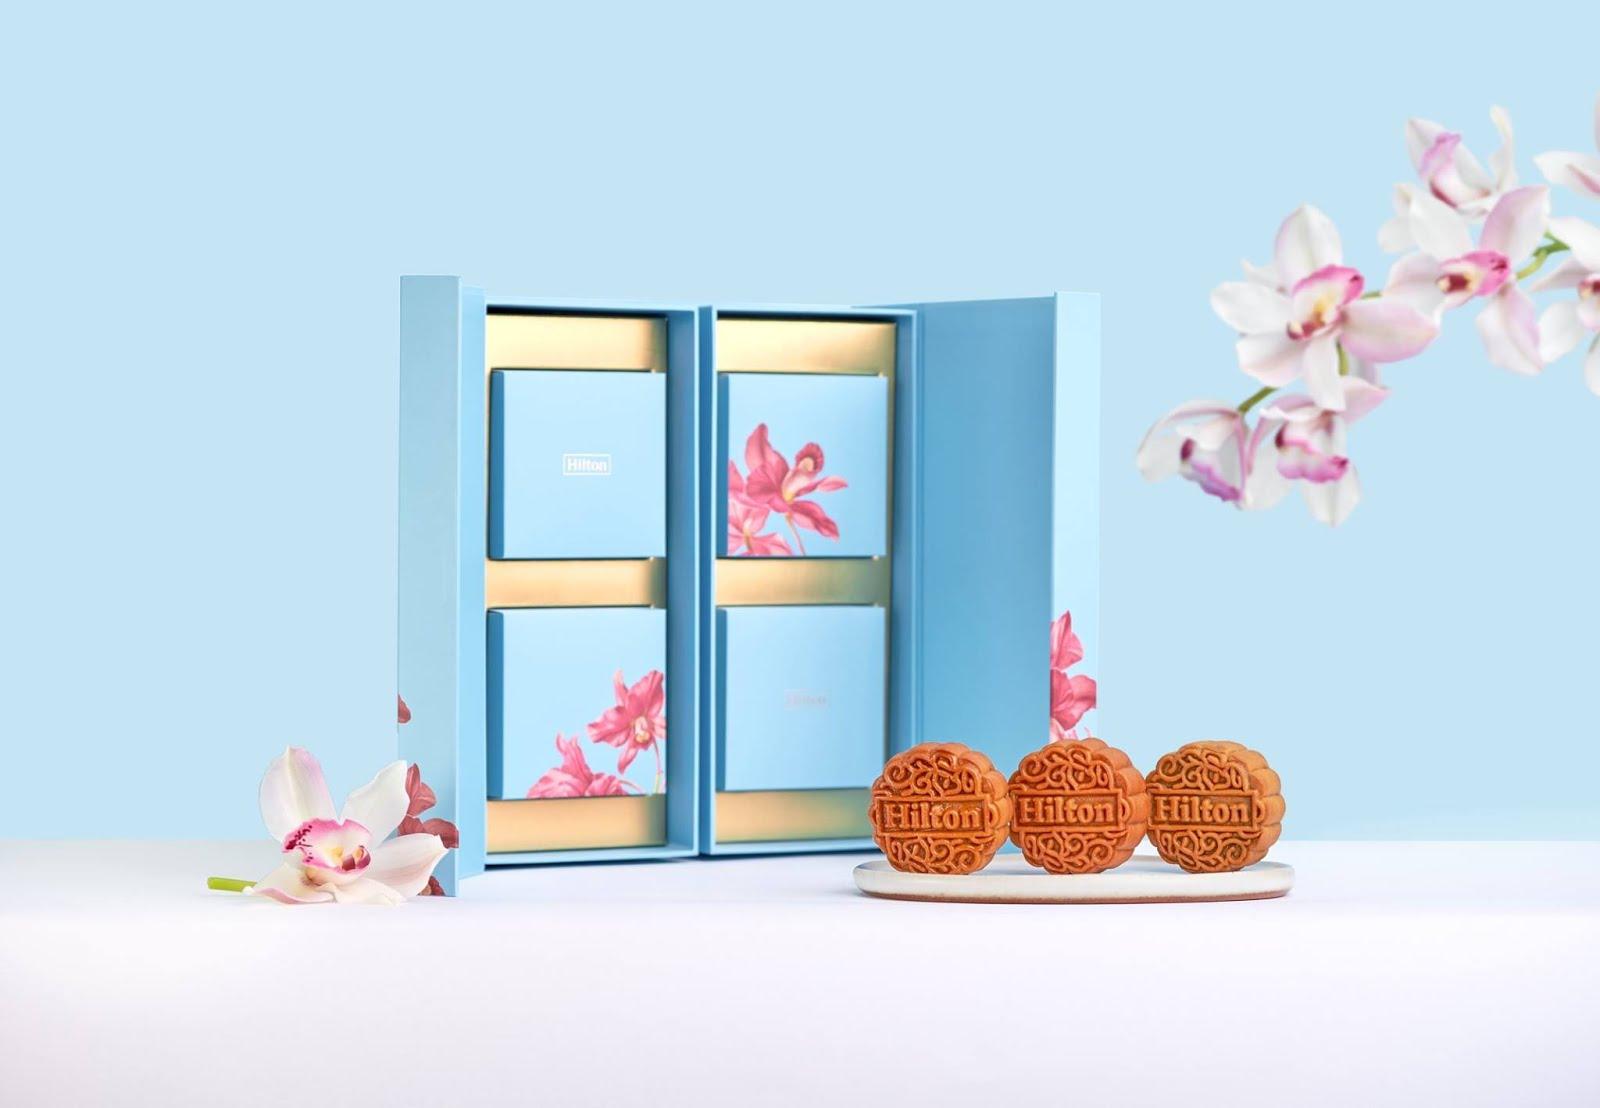 Hilton Celestial Blooms Mooncake Gift Box